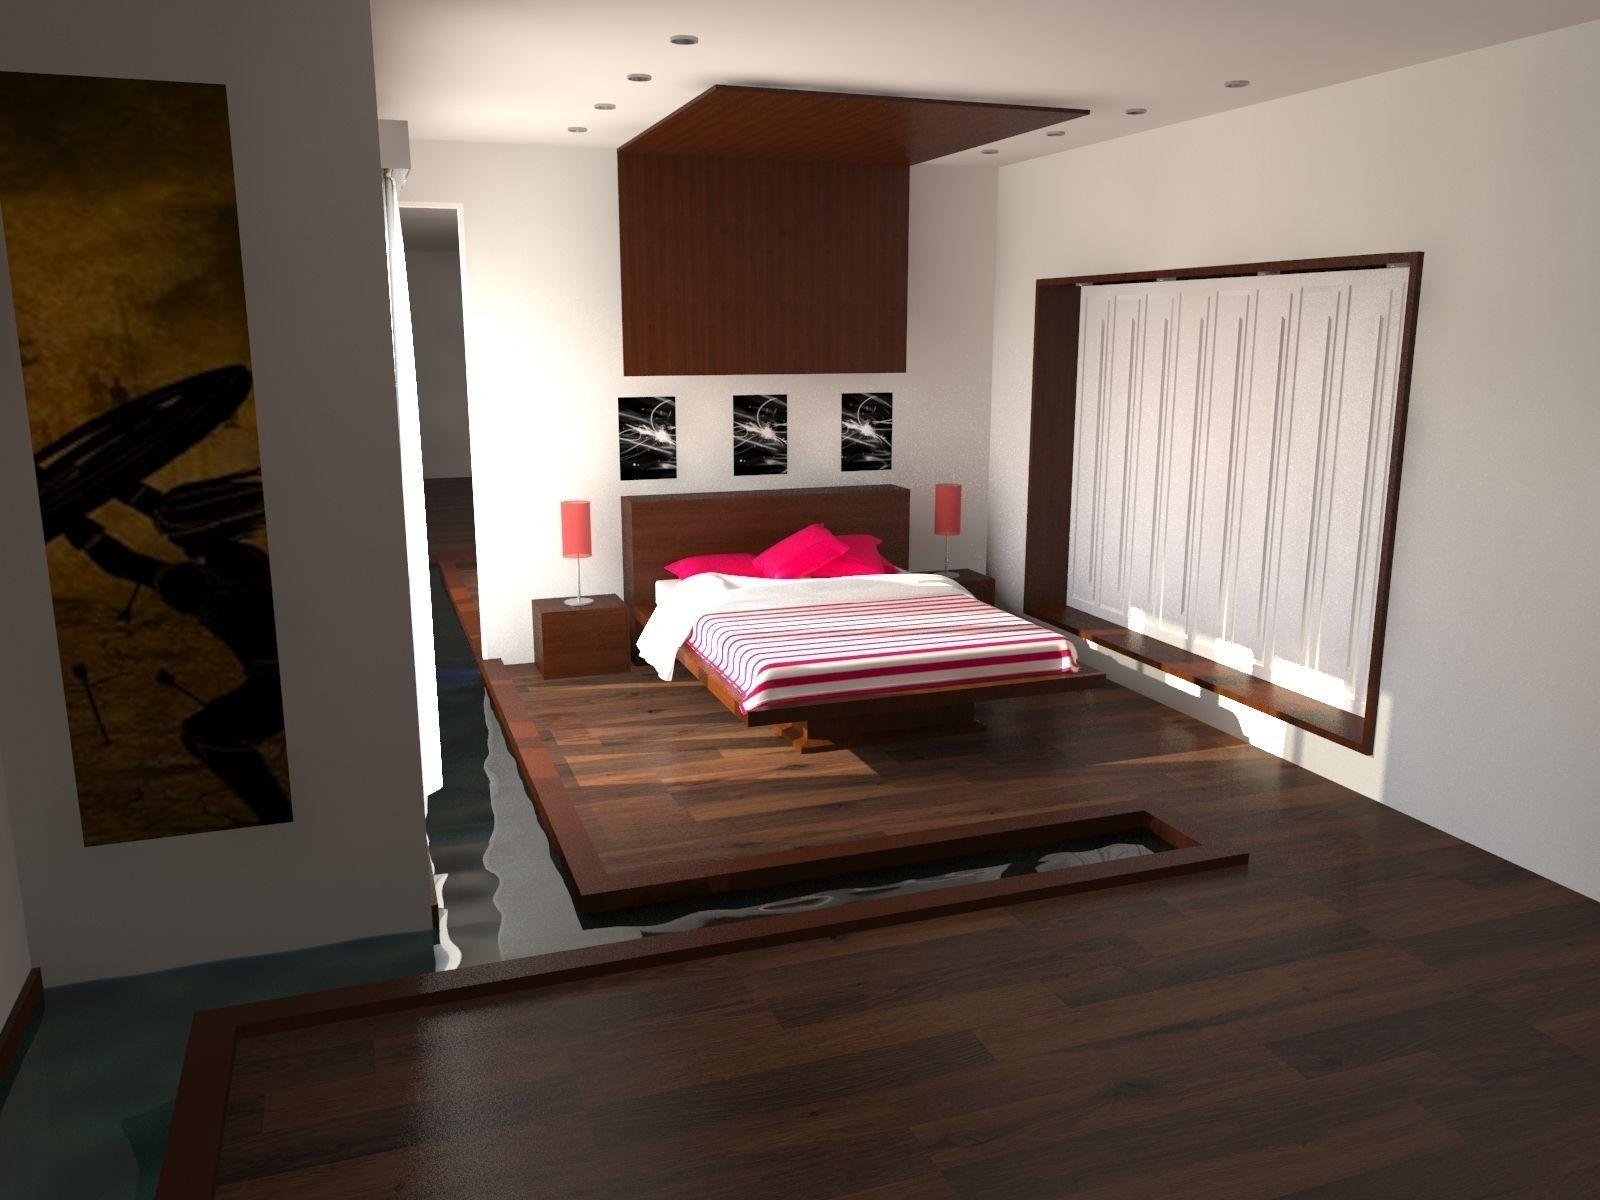 Bedroom Interior With Water Render 3d Model Max 1 ...